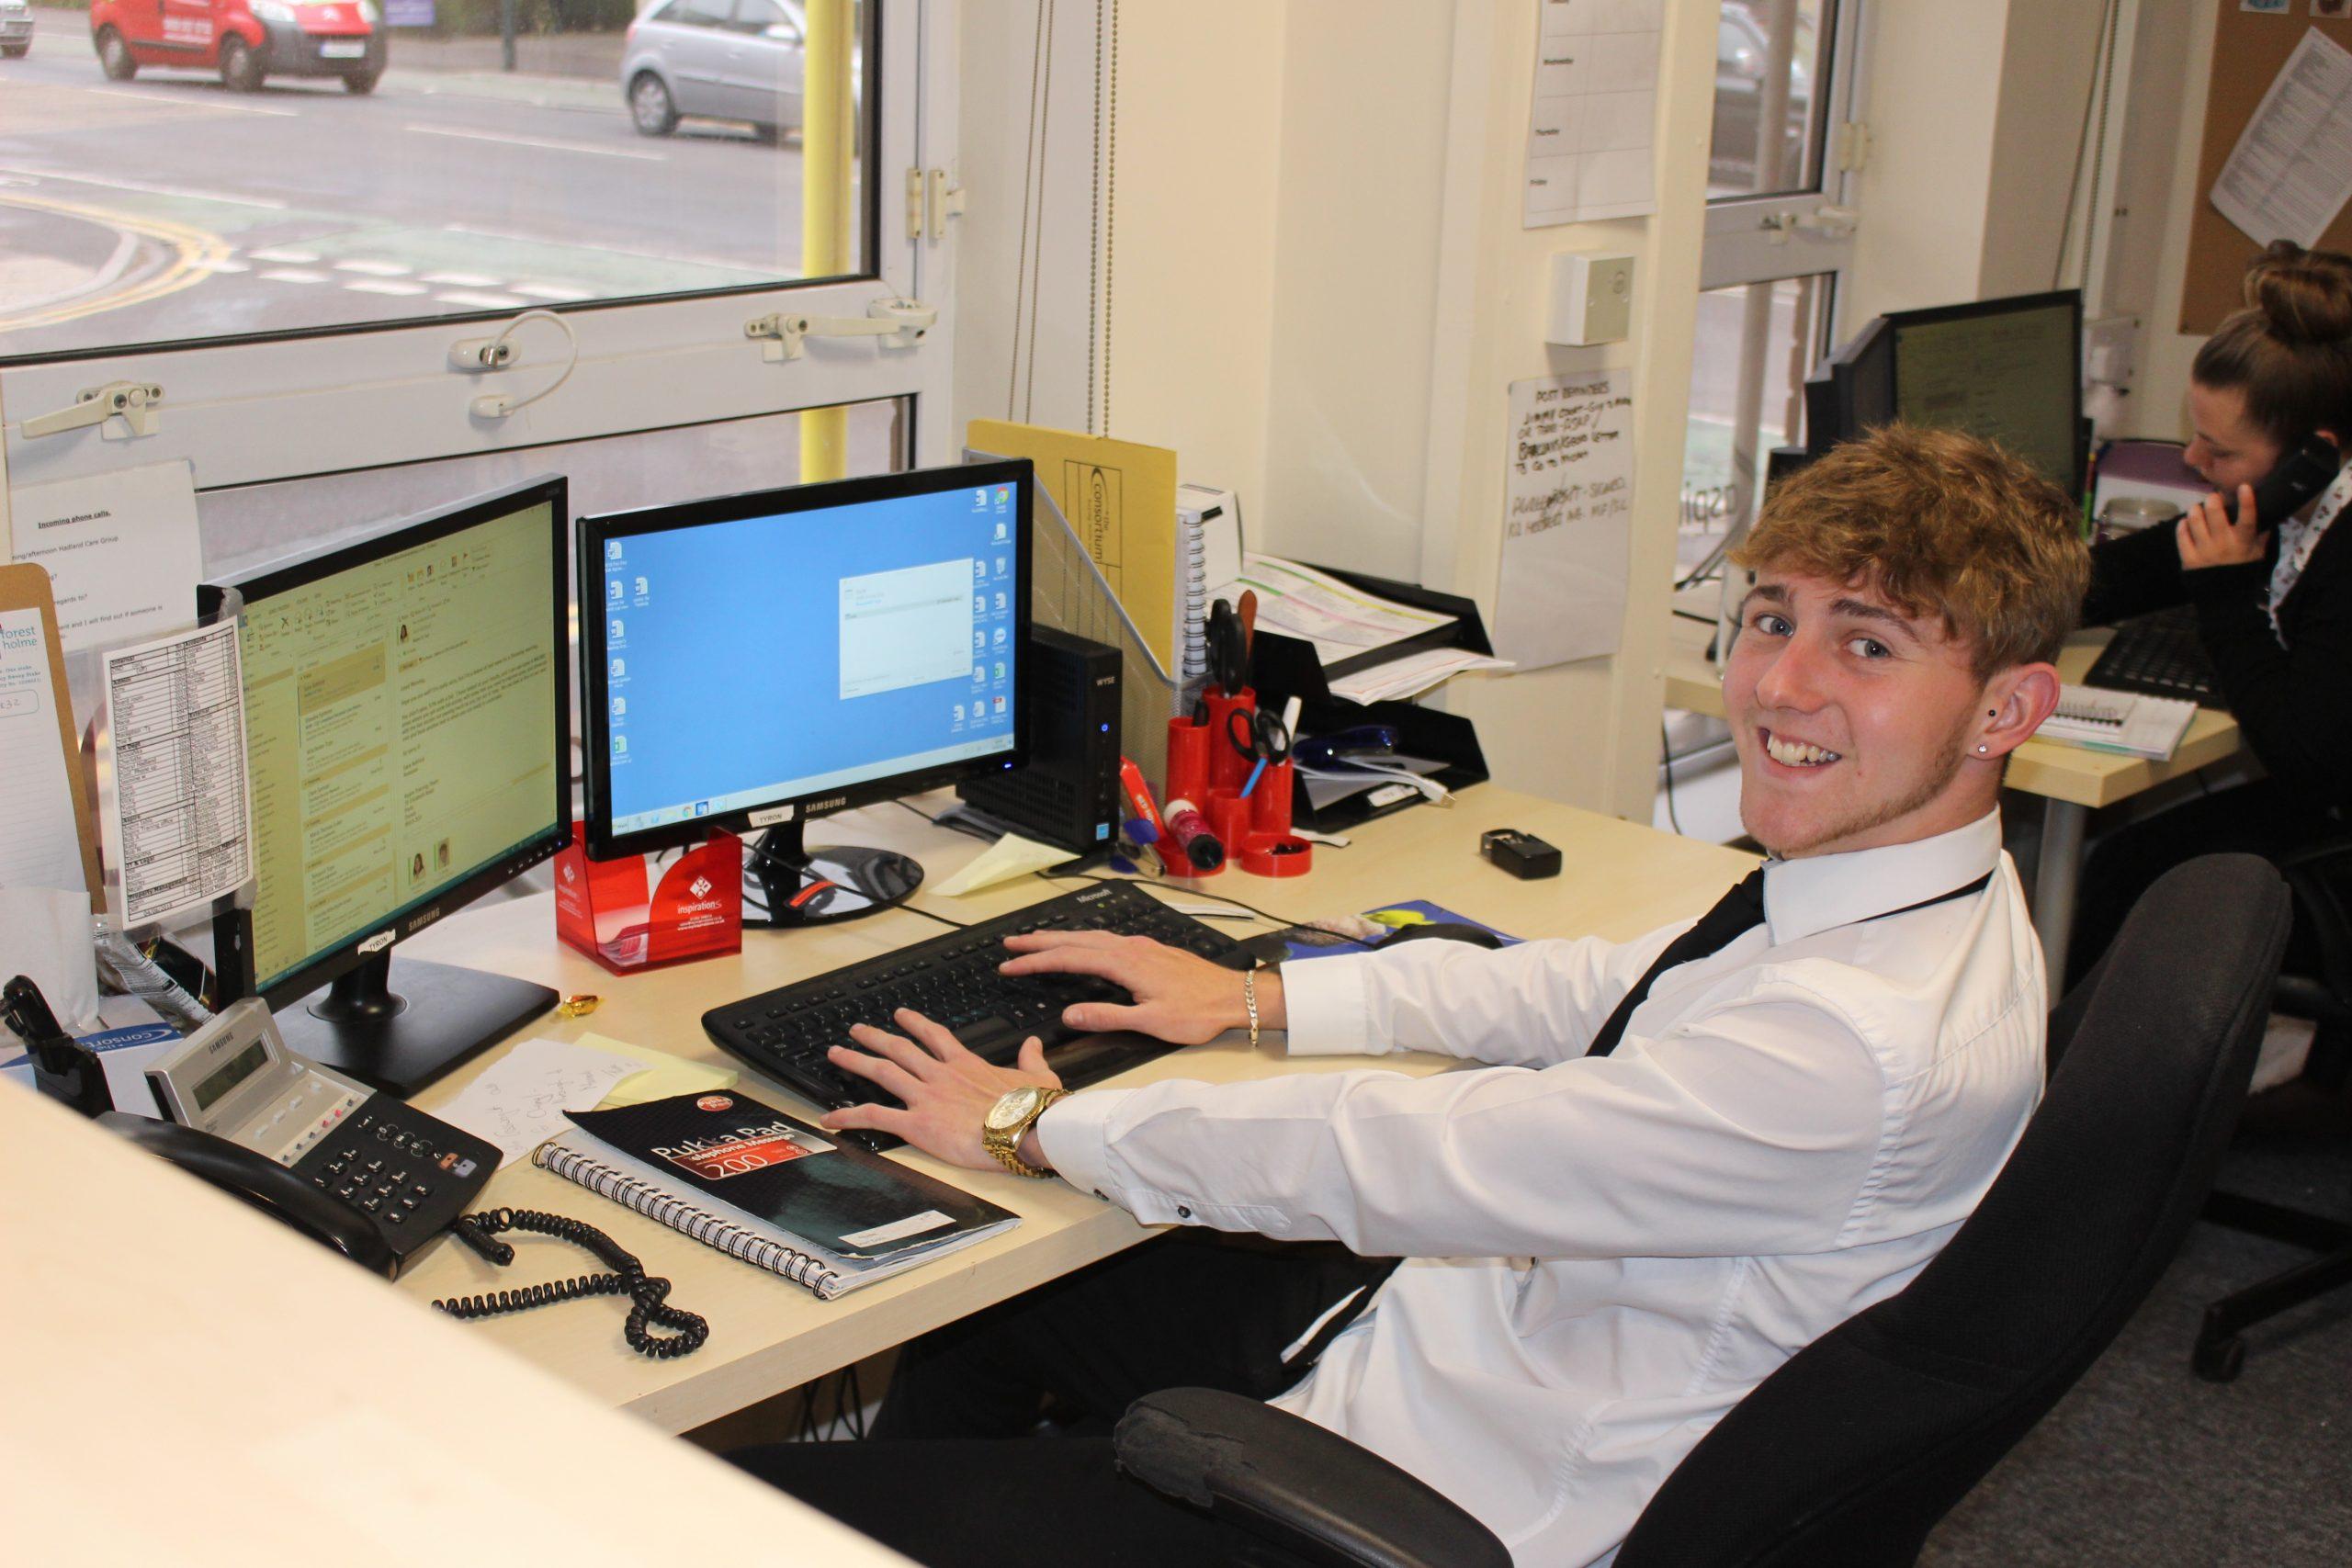 Admin apprentice computer